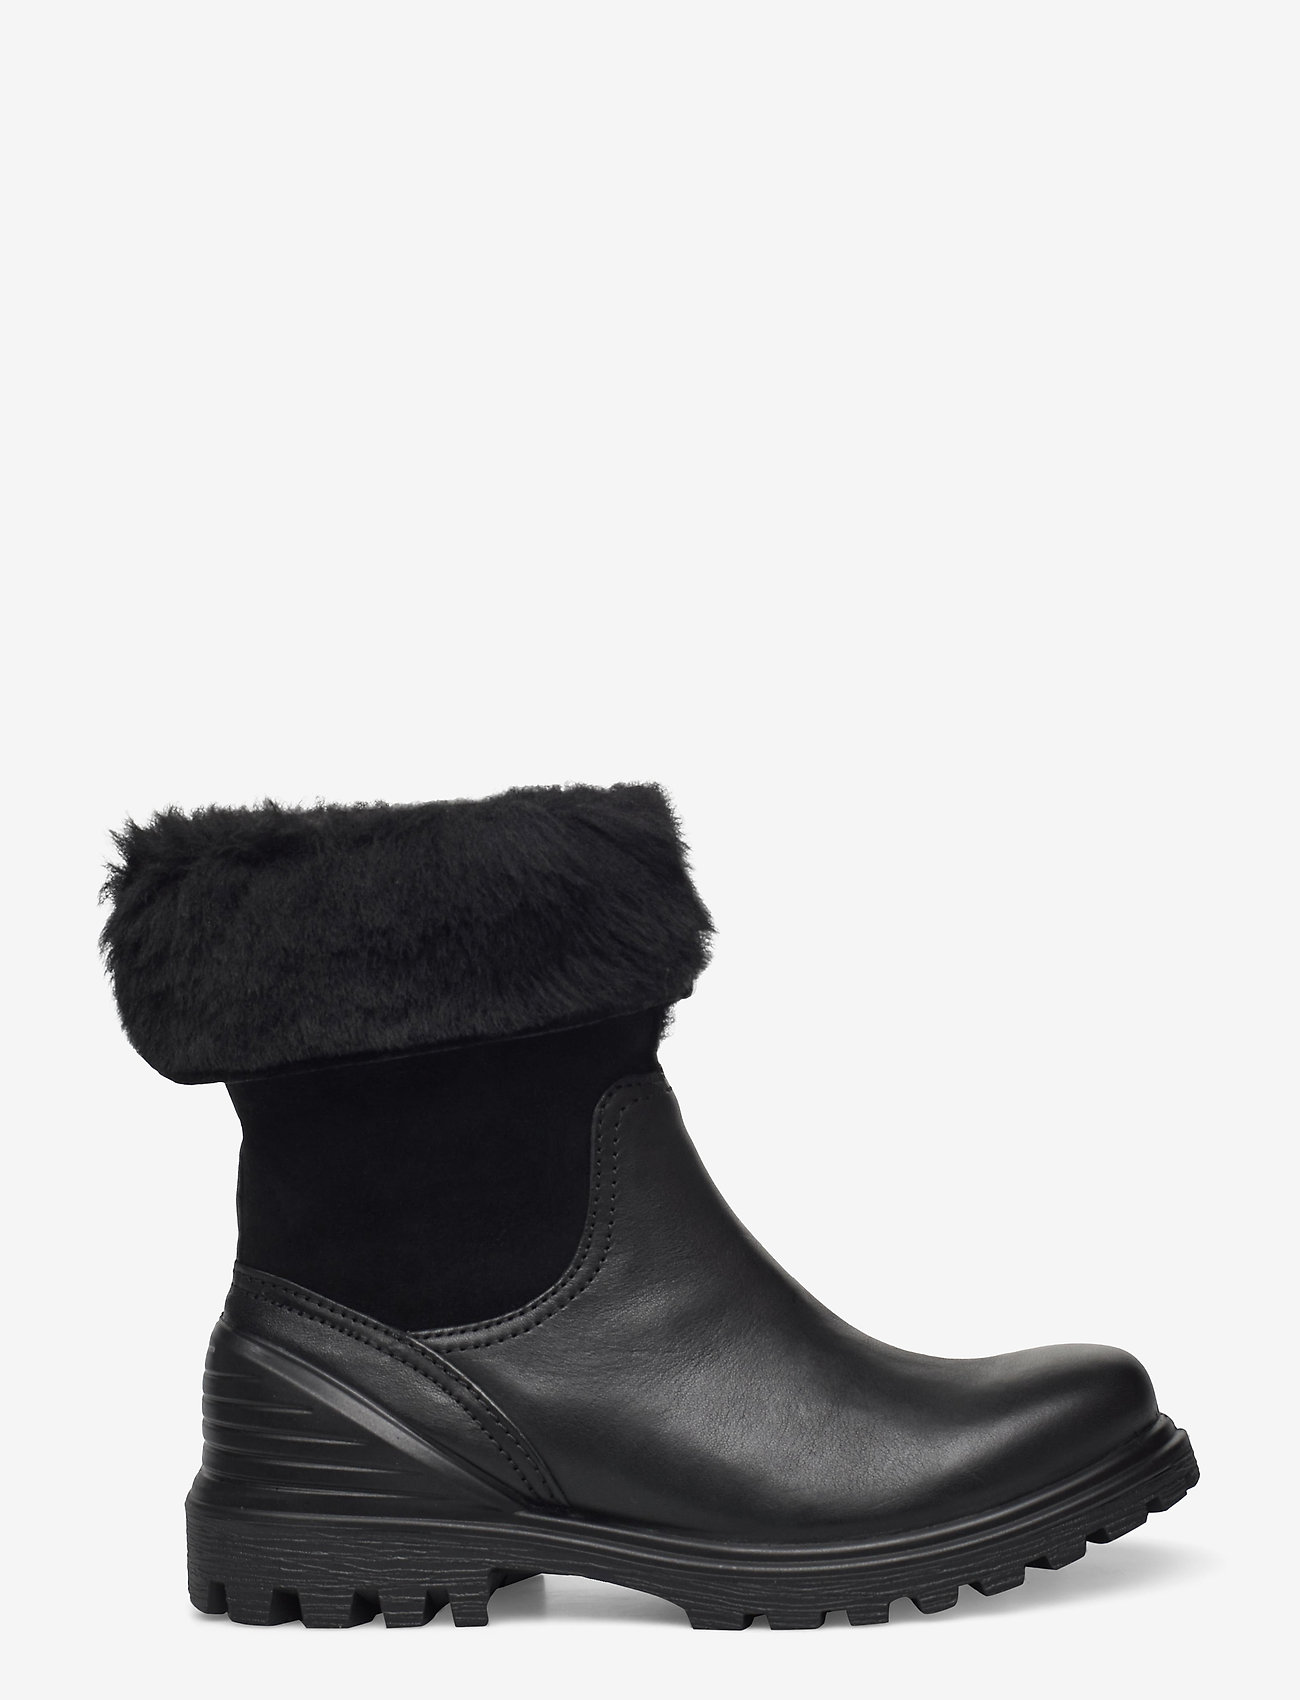 ECCO - TREDTRAY W - flat ankle boots - black/black - 1